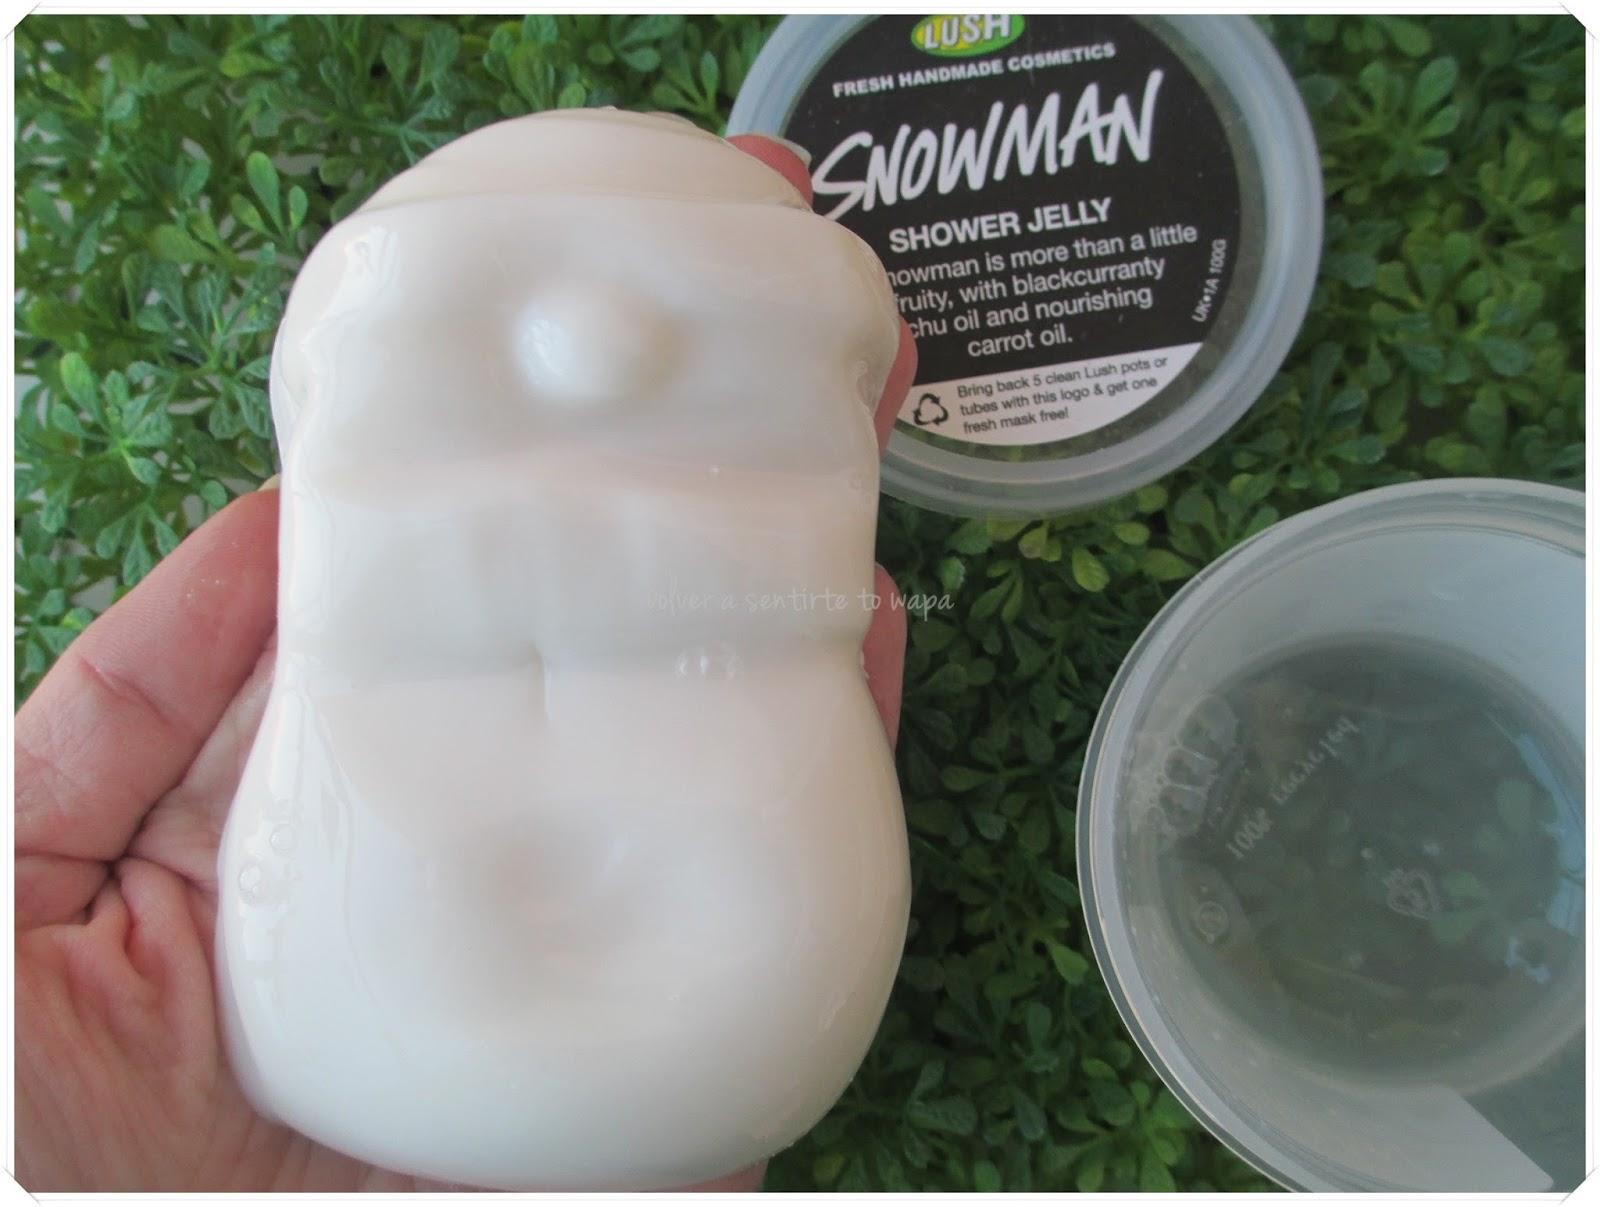 Lush - Gelatina Snowman